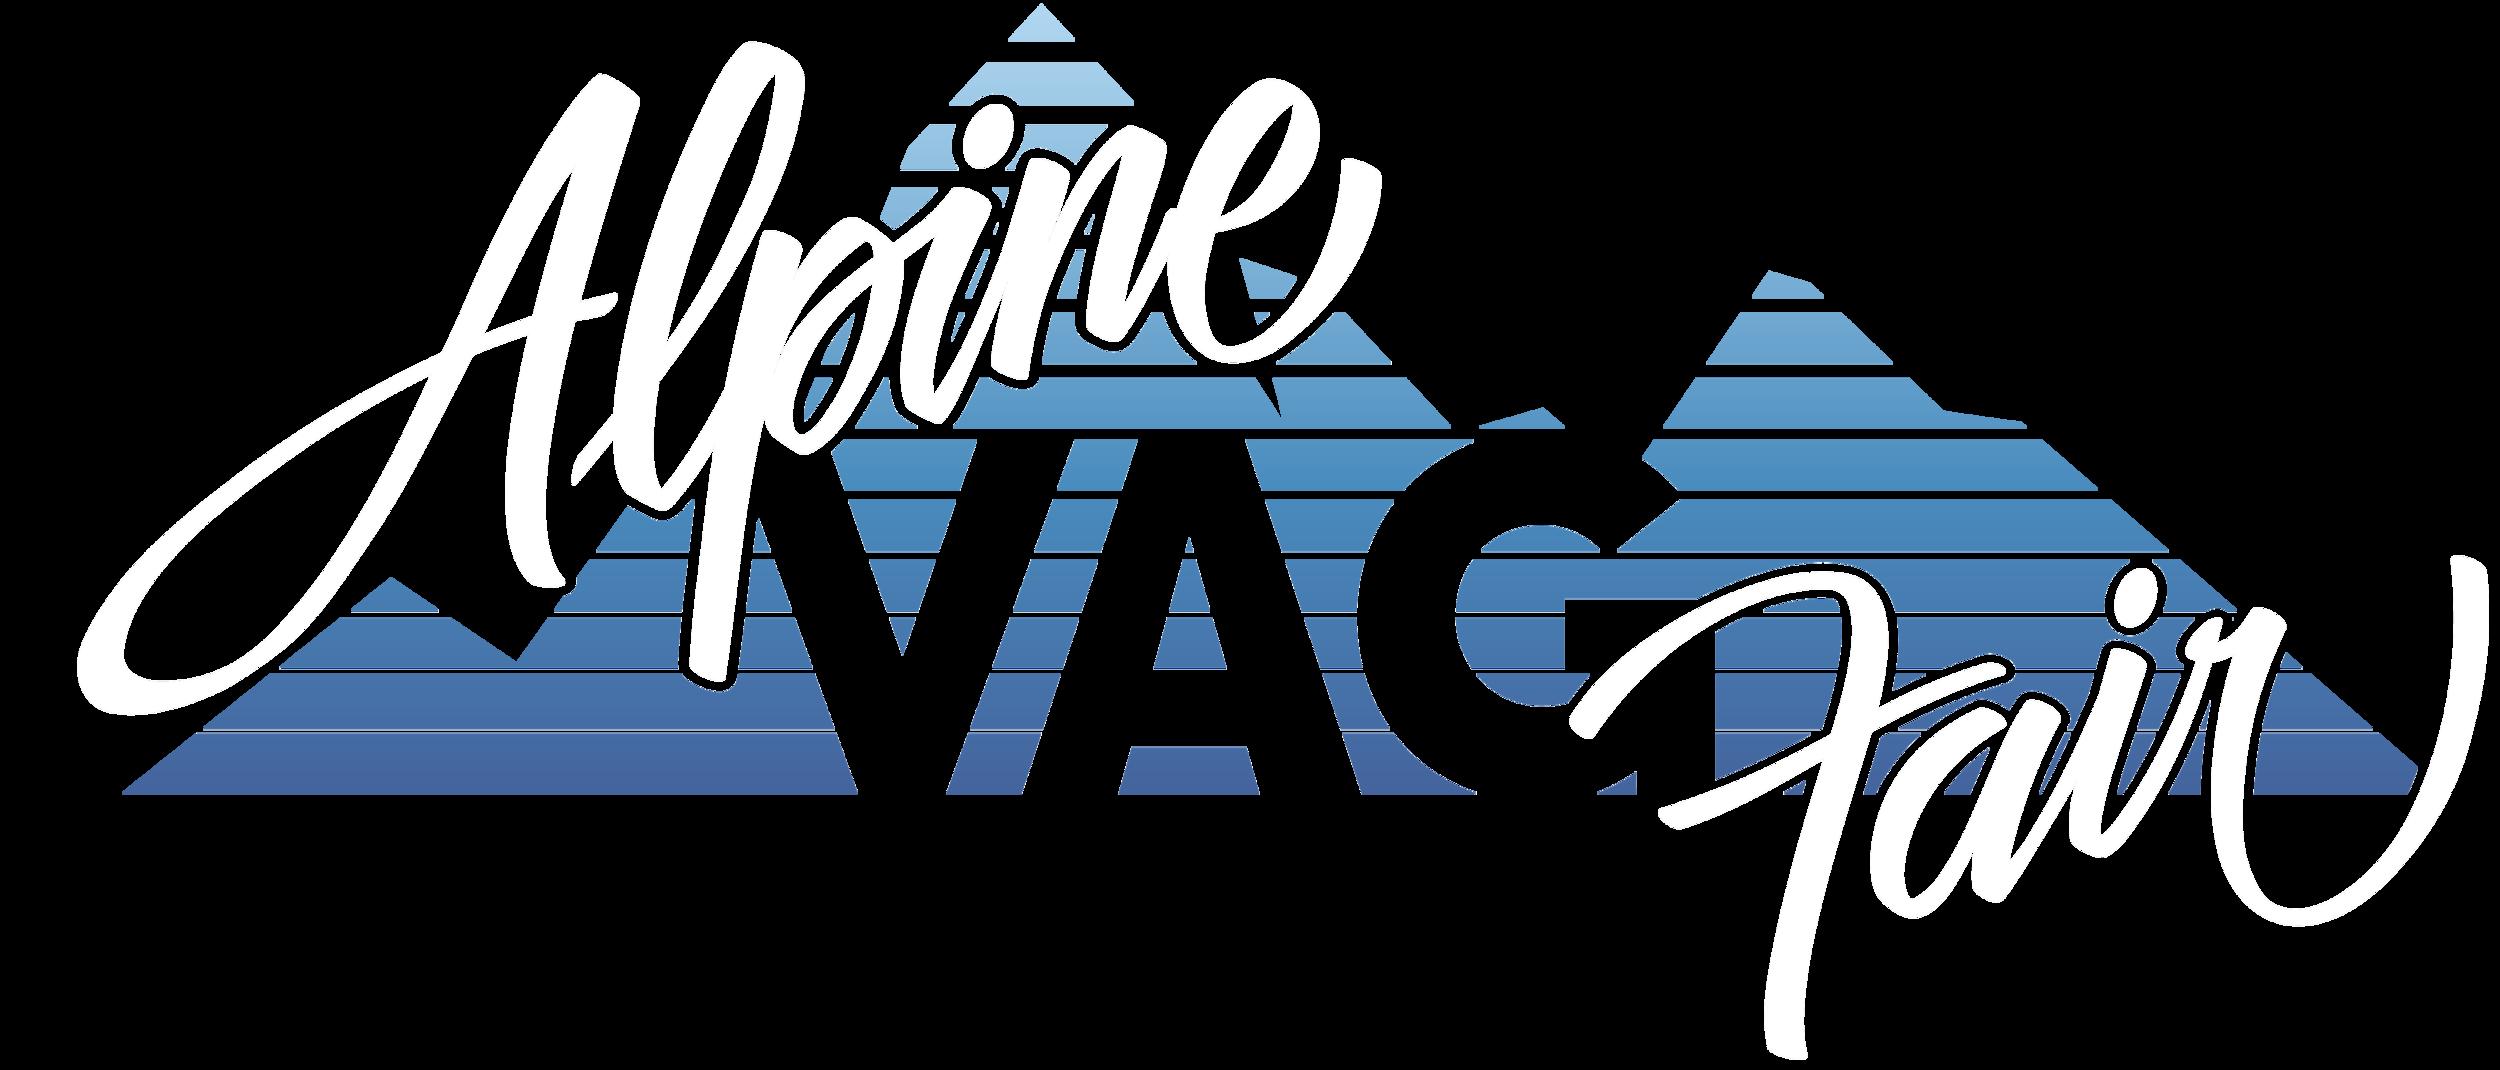 Alpine-VAG-Fair-1 copy.png